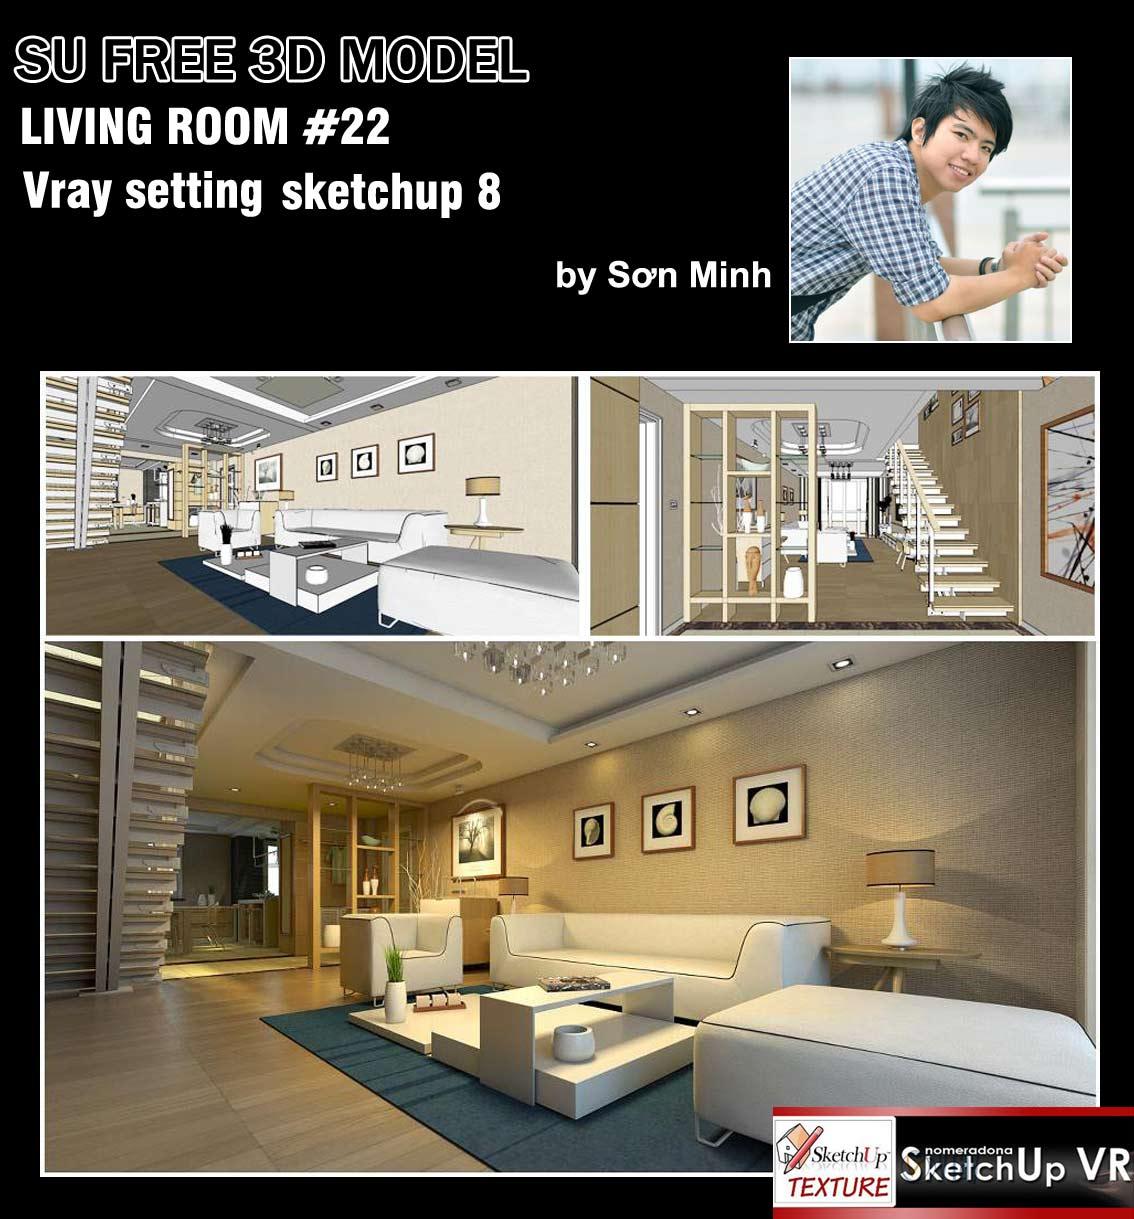 SKETCHUP TEXTURE: SKETCHUP 3D MODEL LIVING ROOM #22